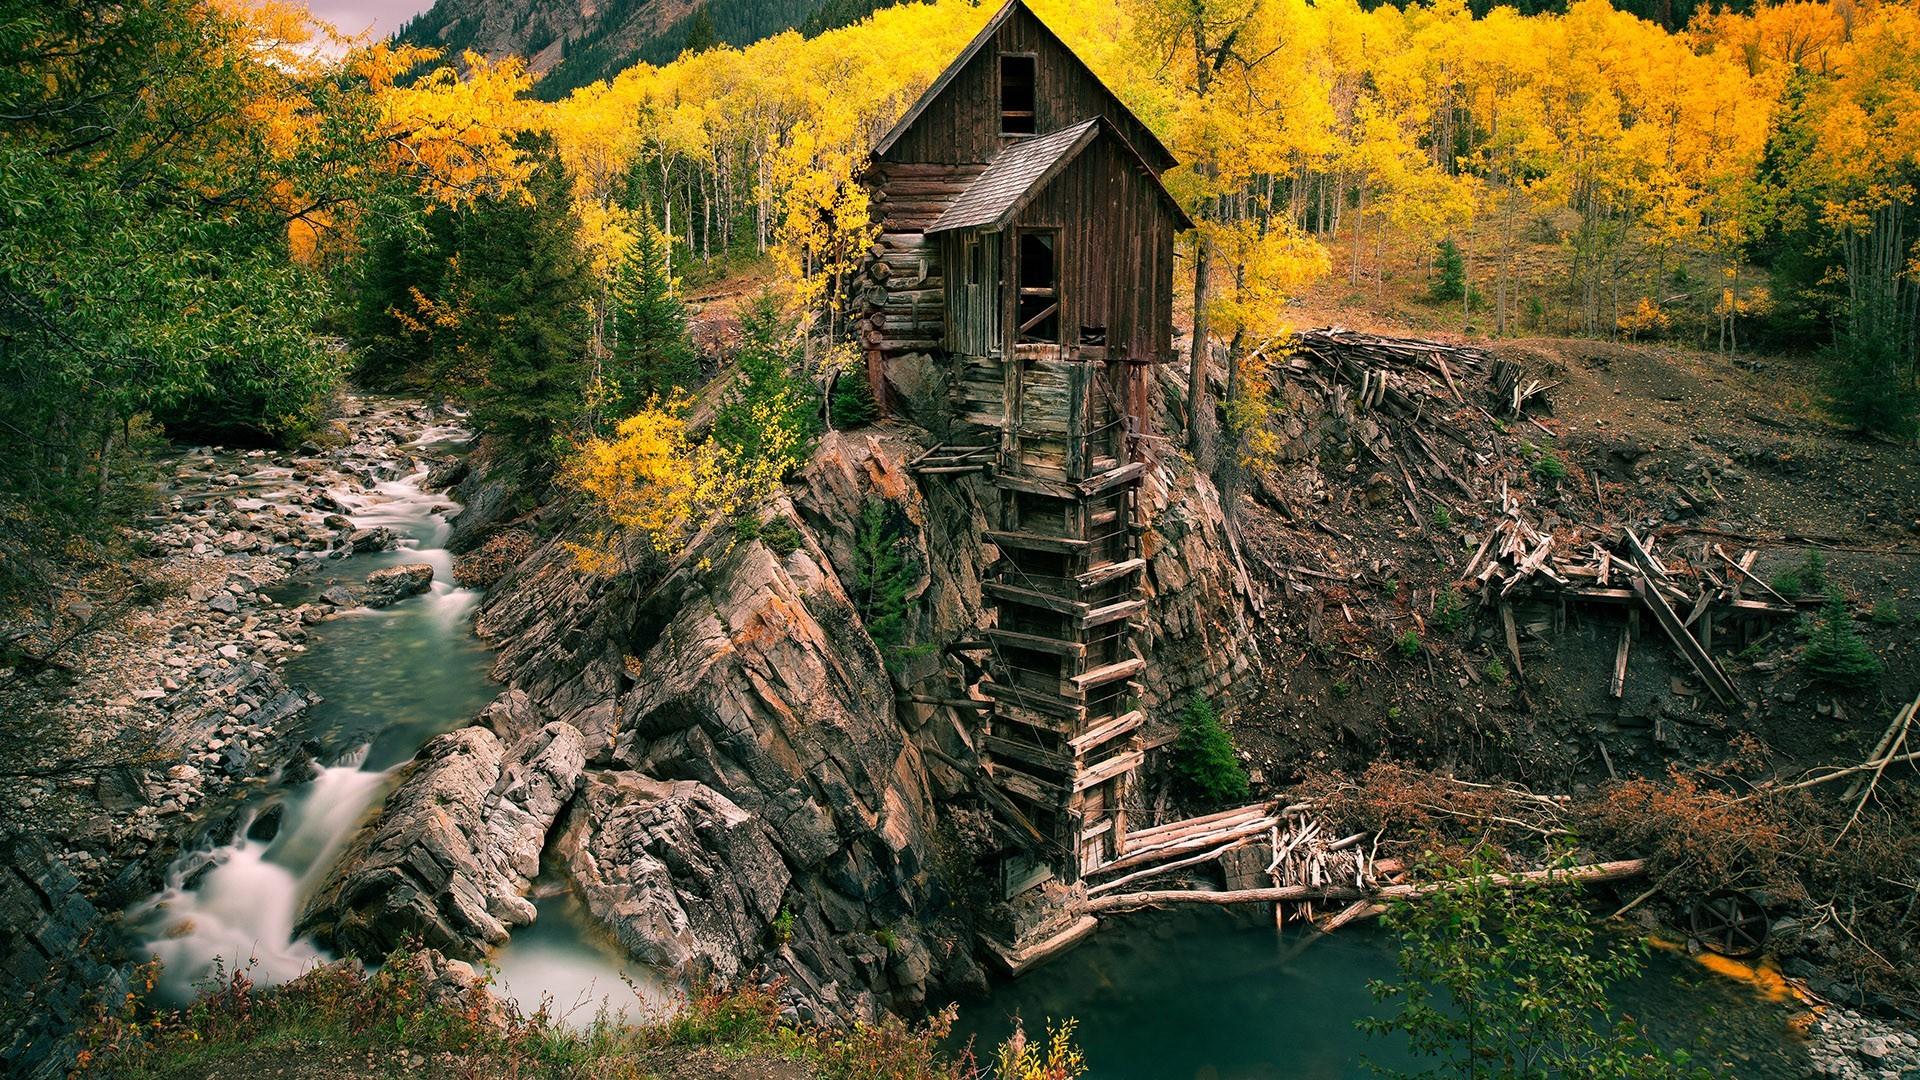 Wallpaper : landscape, forest, garden, nature, reflection, field ...